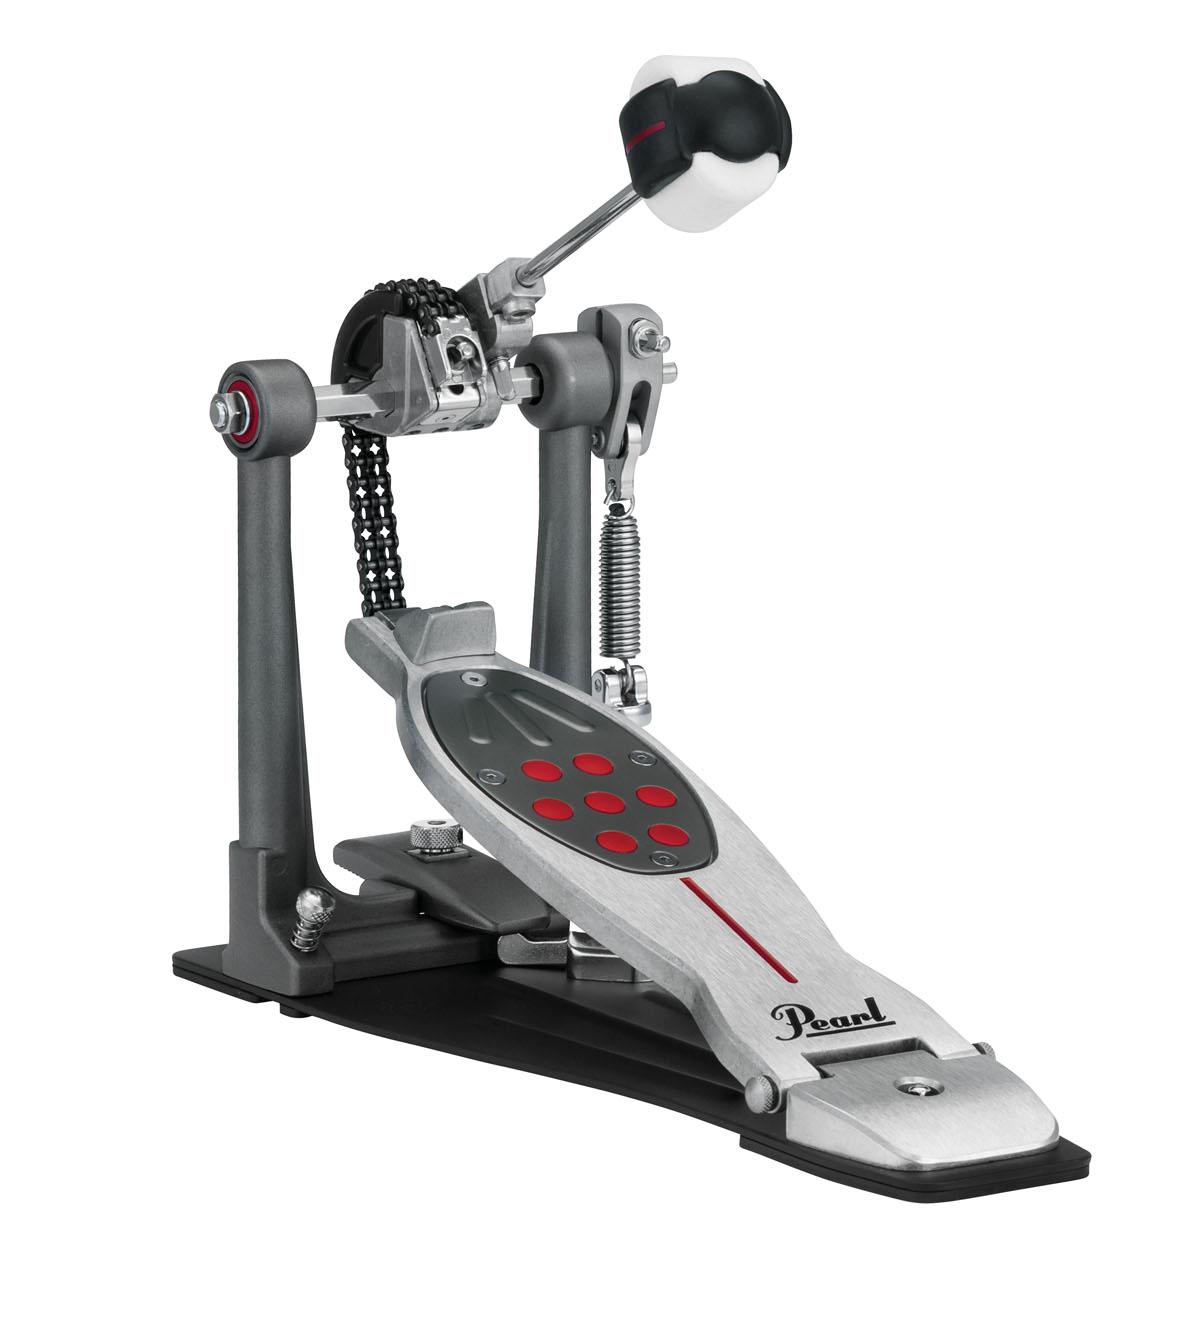 Eliminator Redline Chain Kick Pedal